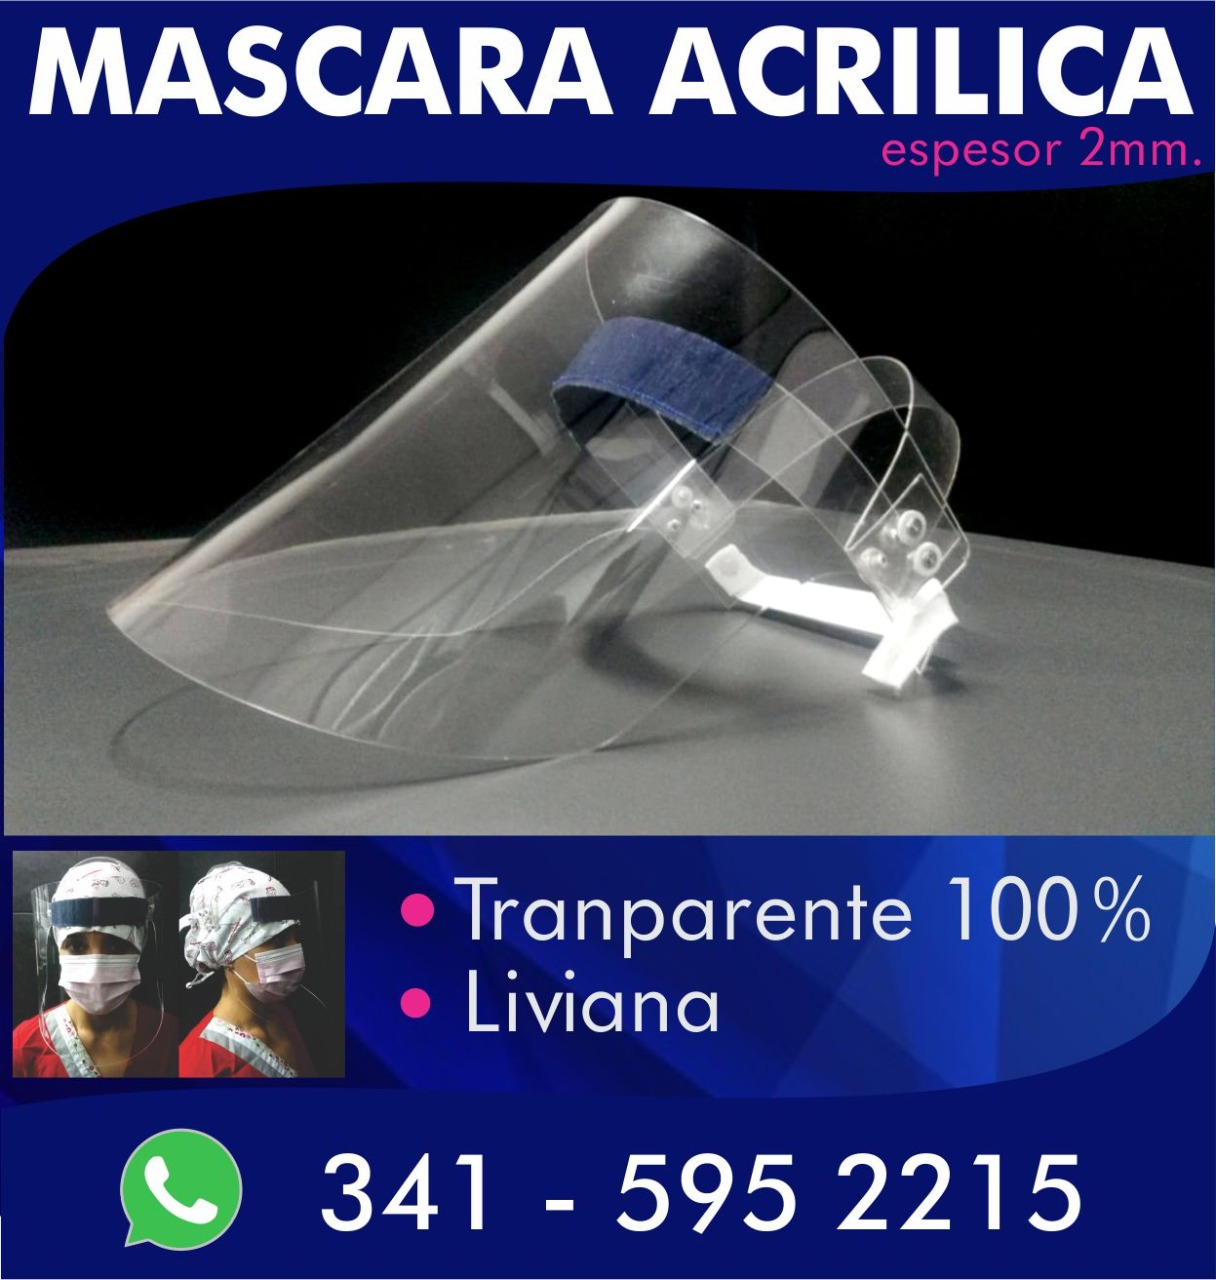 Máscara Acrílica COVID-19